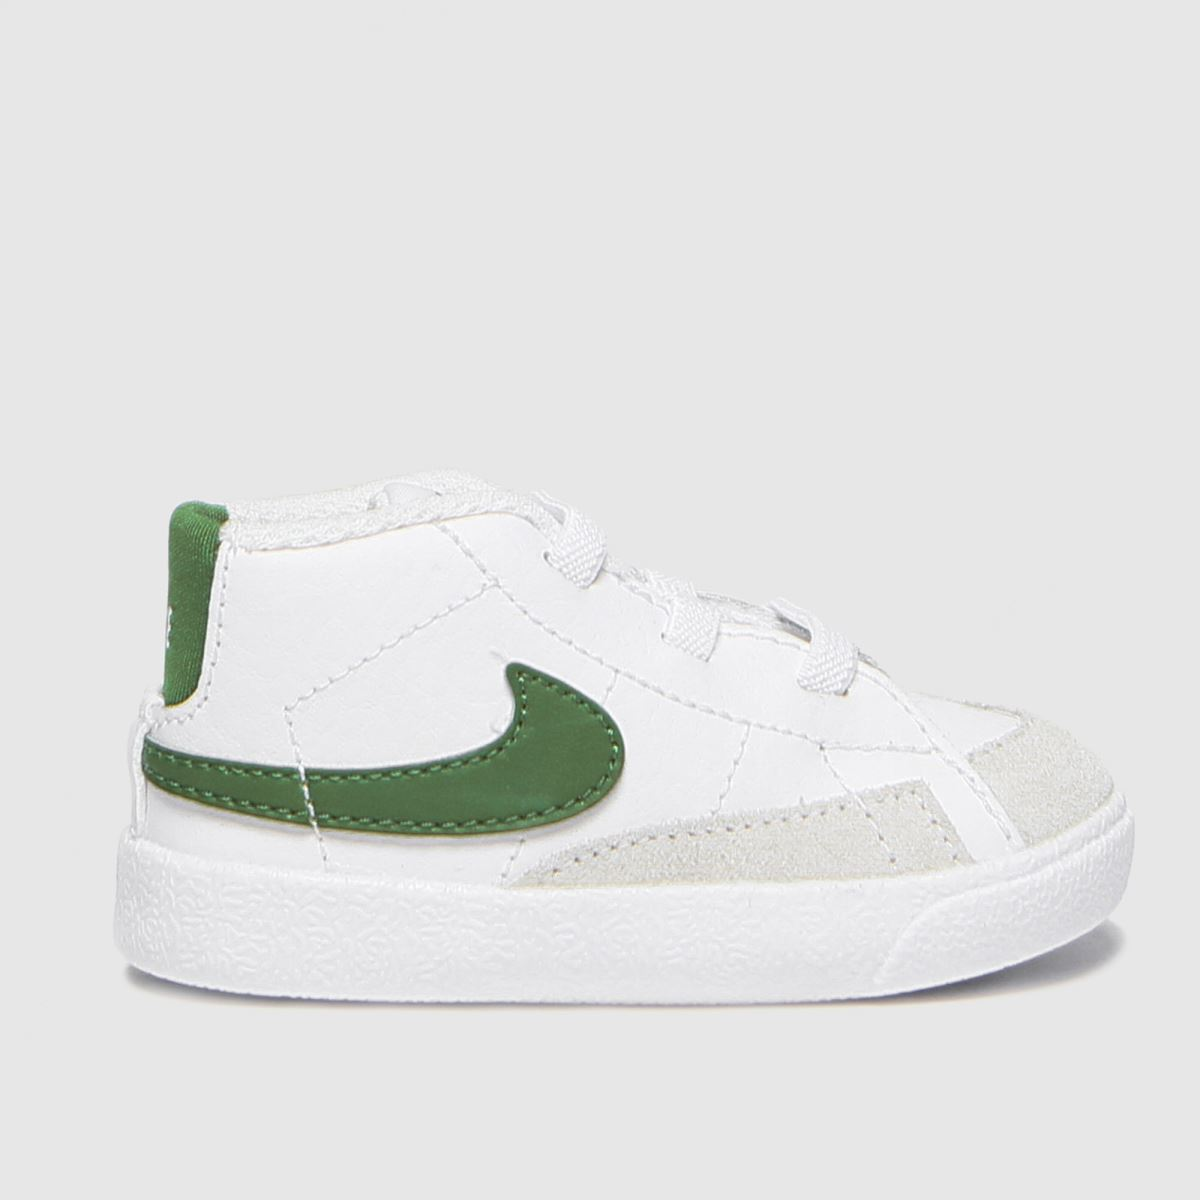 Nike Nike White & Green Blazer Mid Crib Shoes Baby